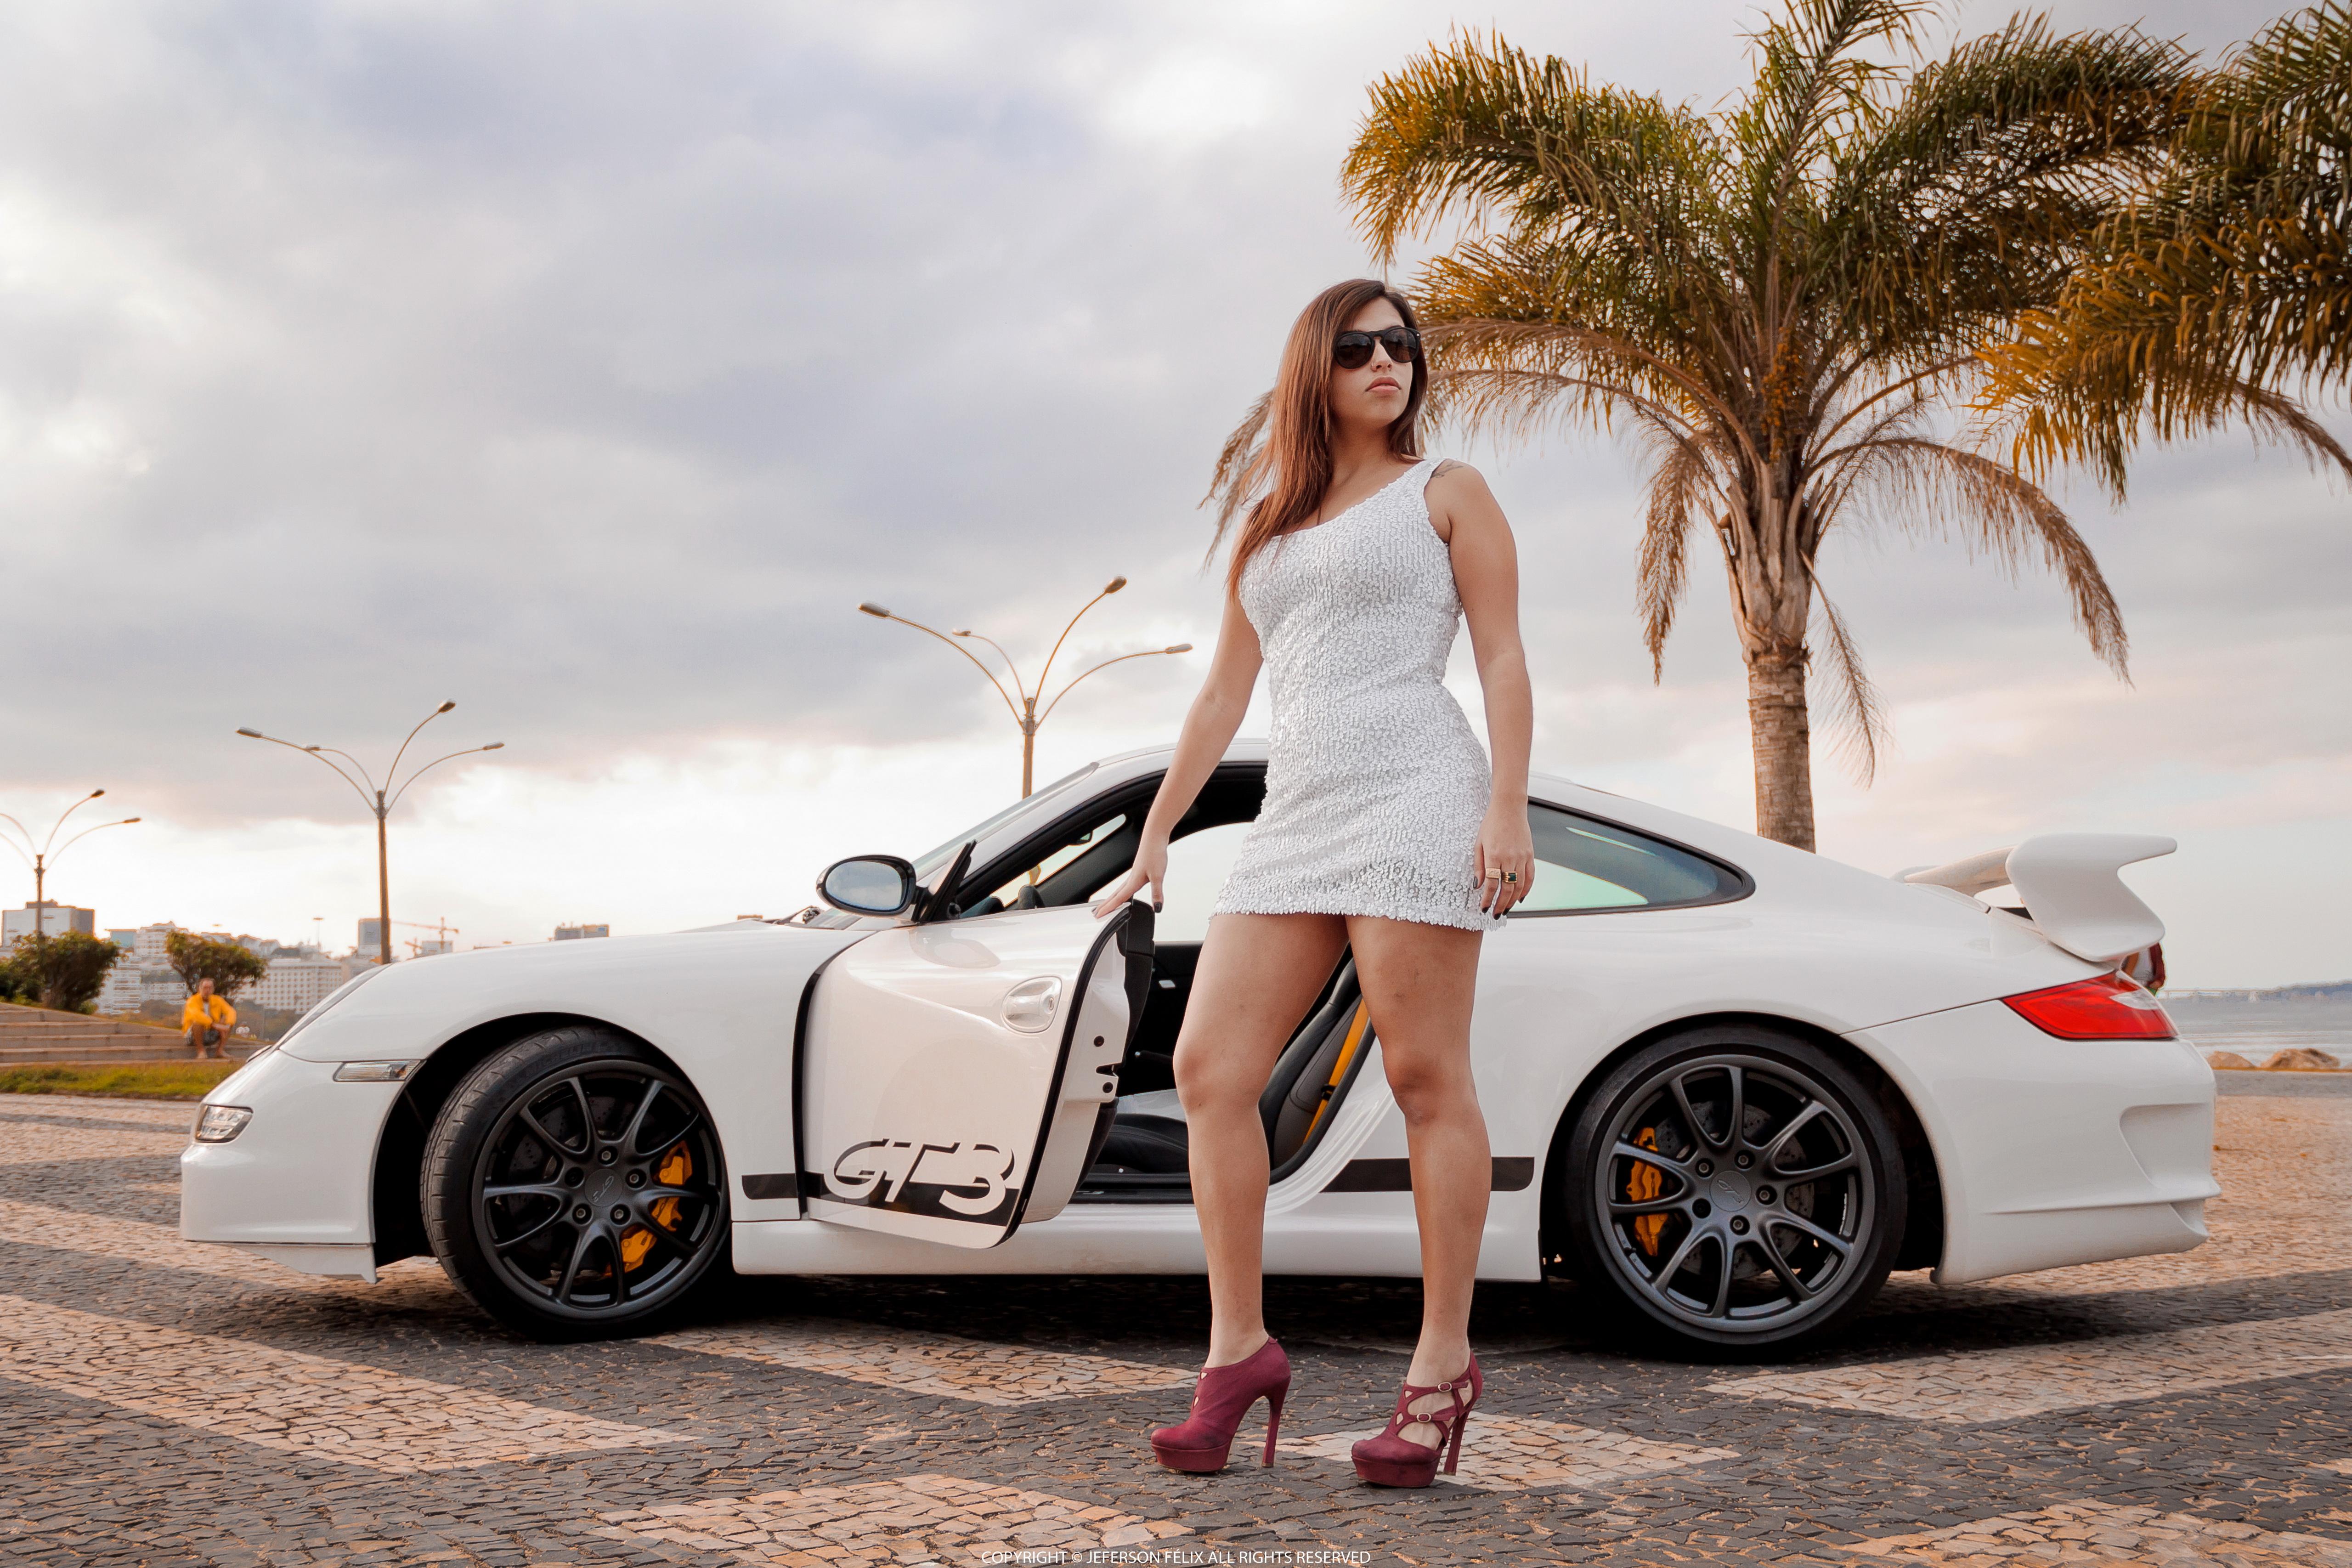 3840x1080 Wallpaper Cars Reddut Dziewczyny I Samochody 5k Retina Ultra Tapeta Hd Tło